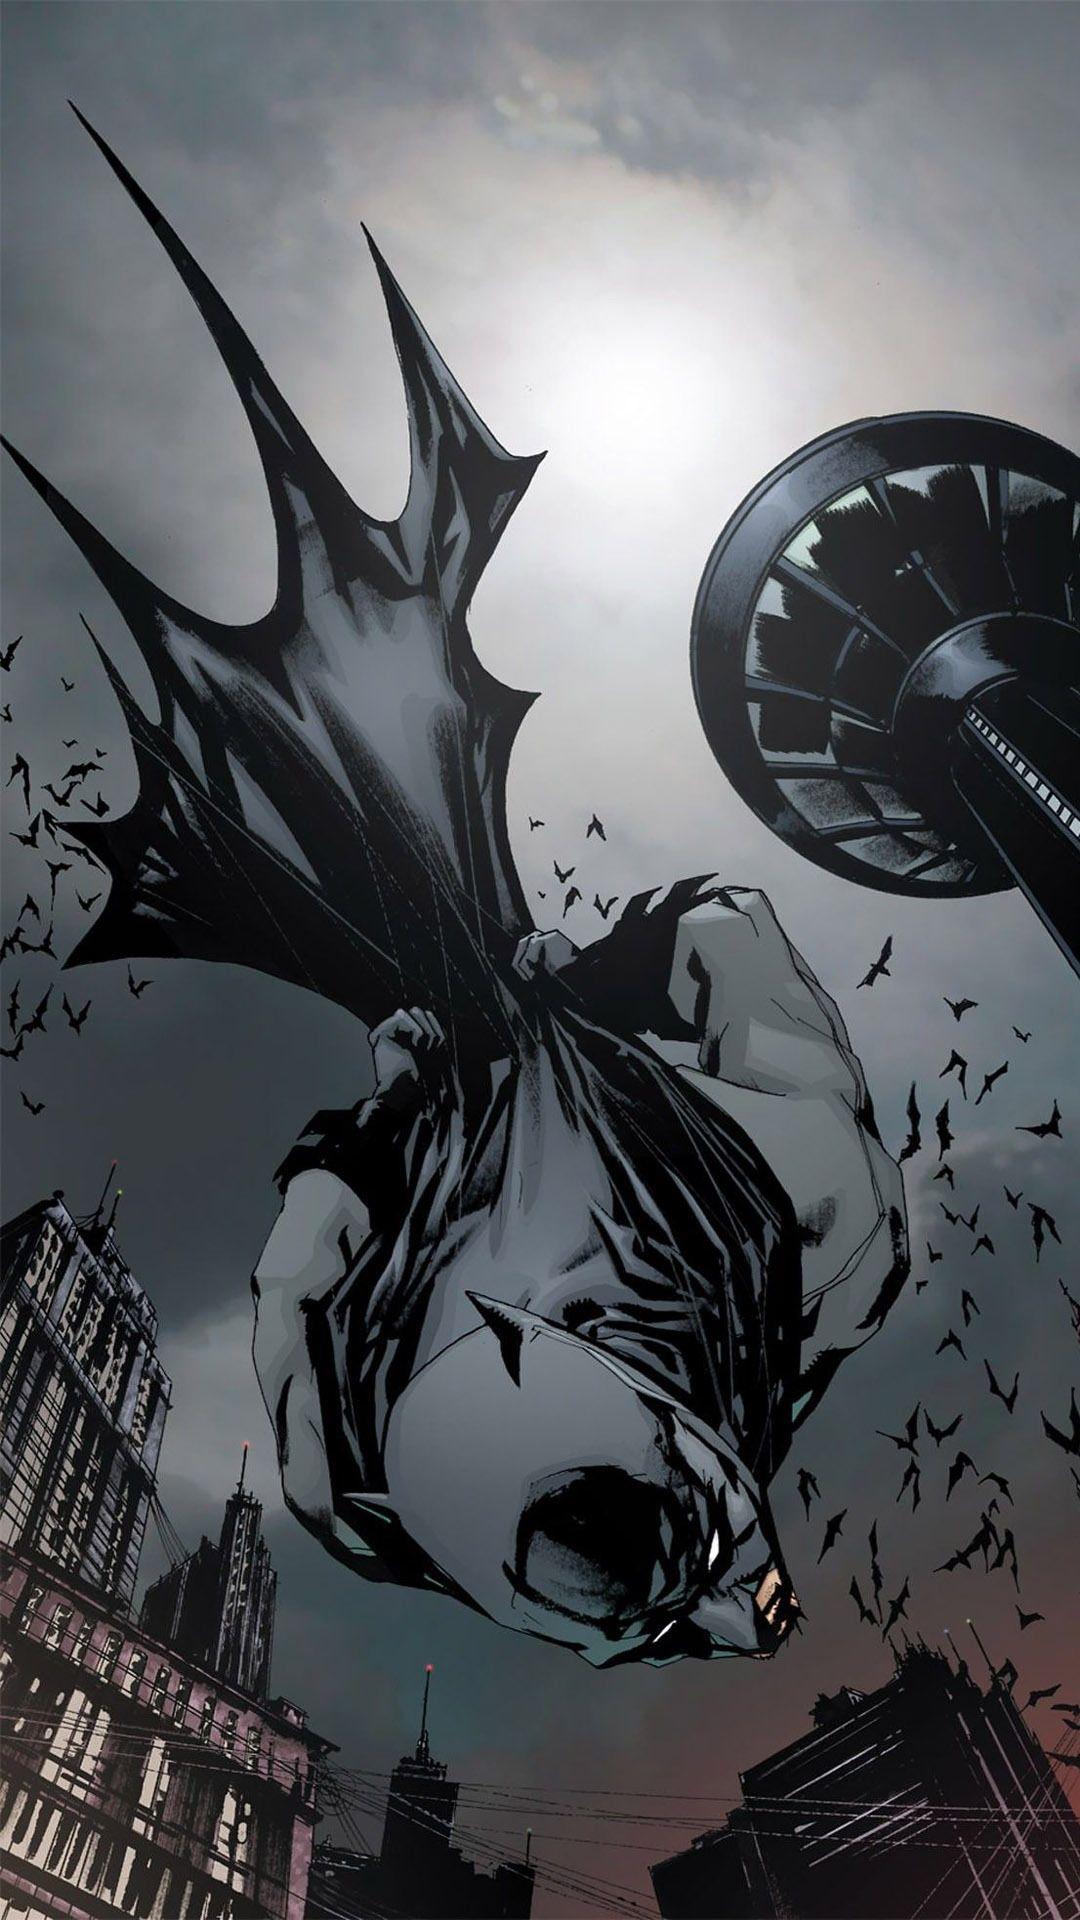 Best Wallpaper Mobile Superhero - batman-mobile-wallpaper-3  Trends_924983.jpg